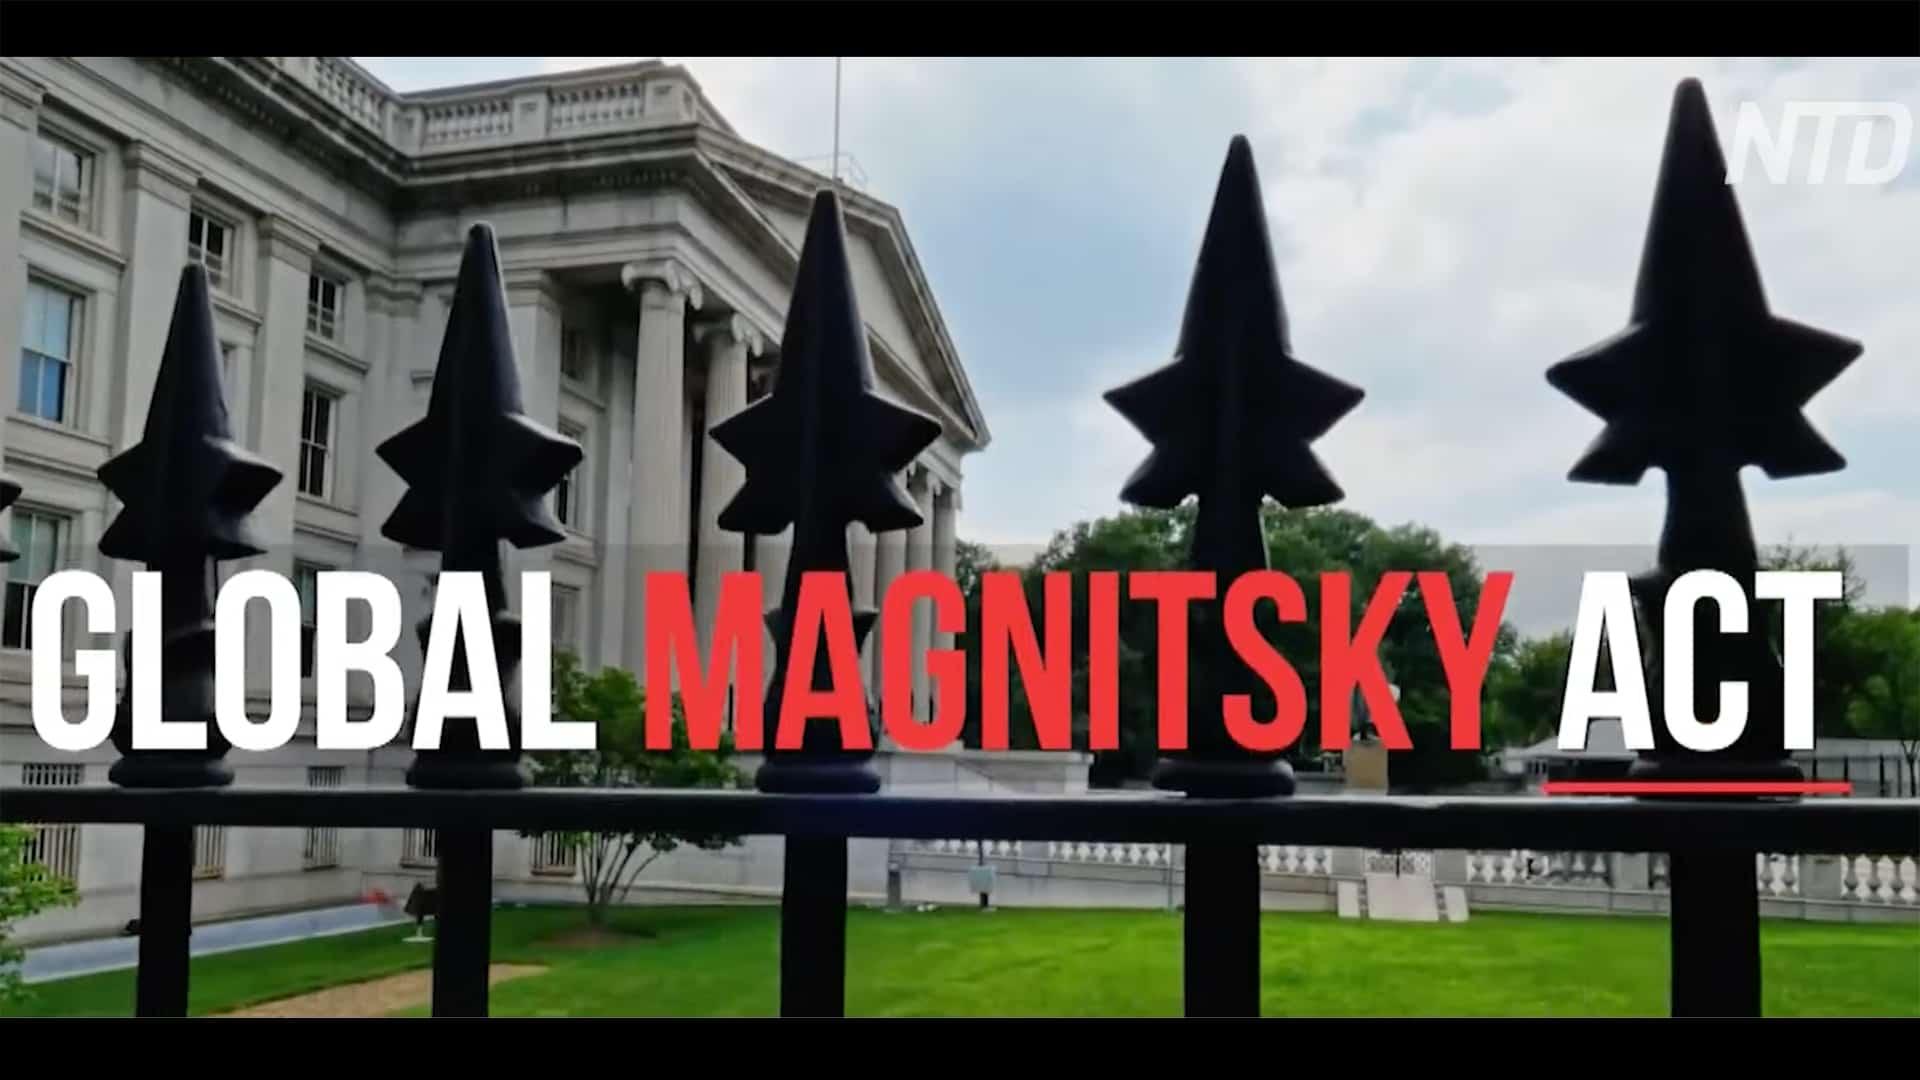 Global Magnitsky act